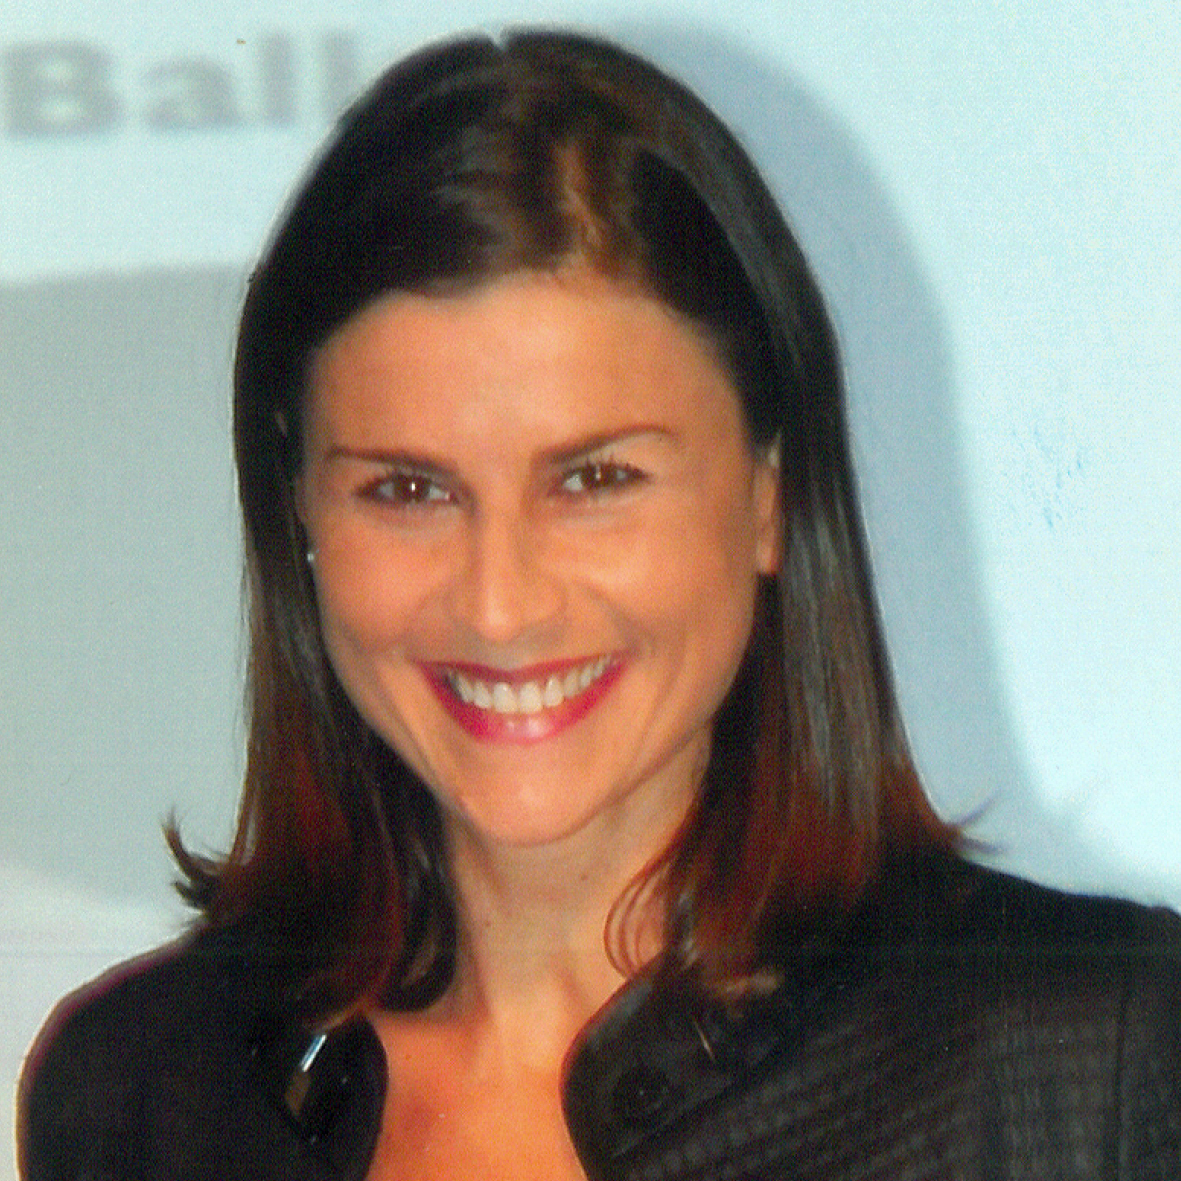 Sonia Sammauro